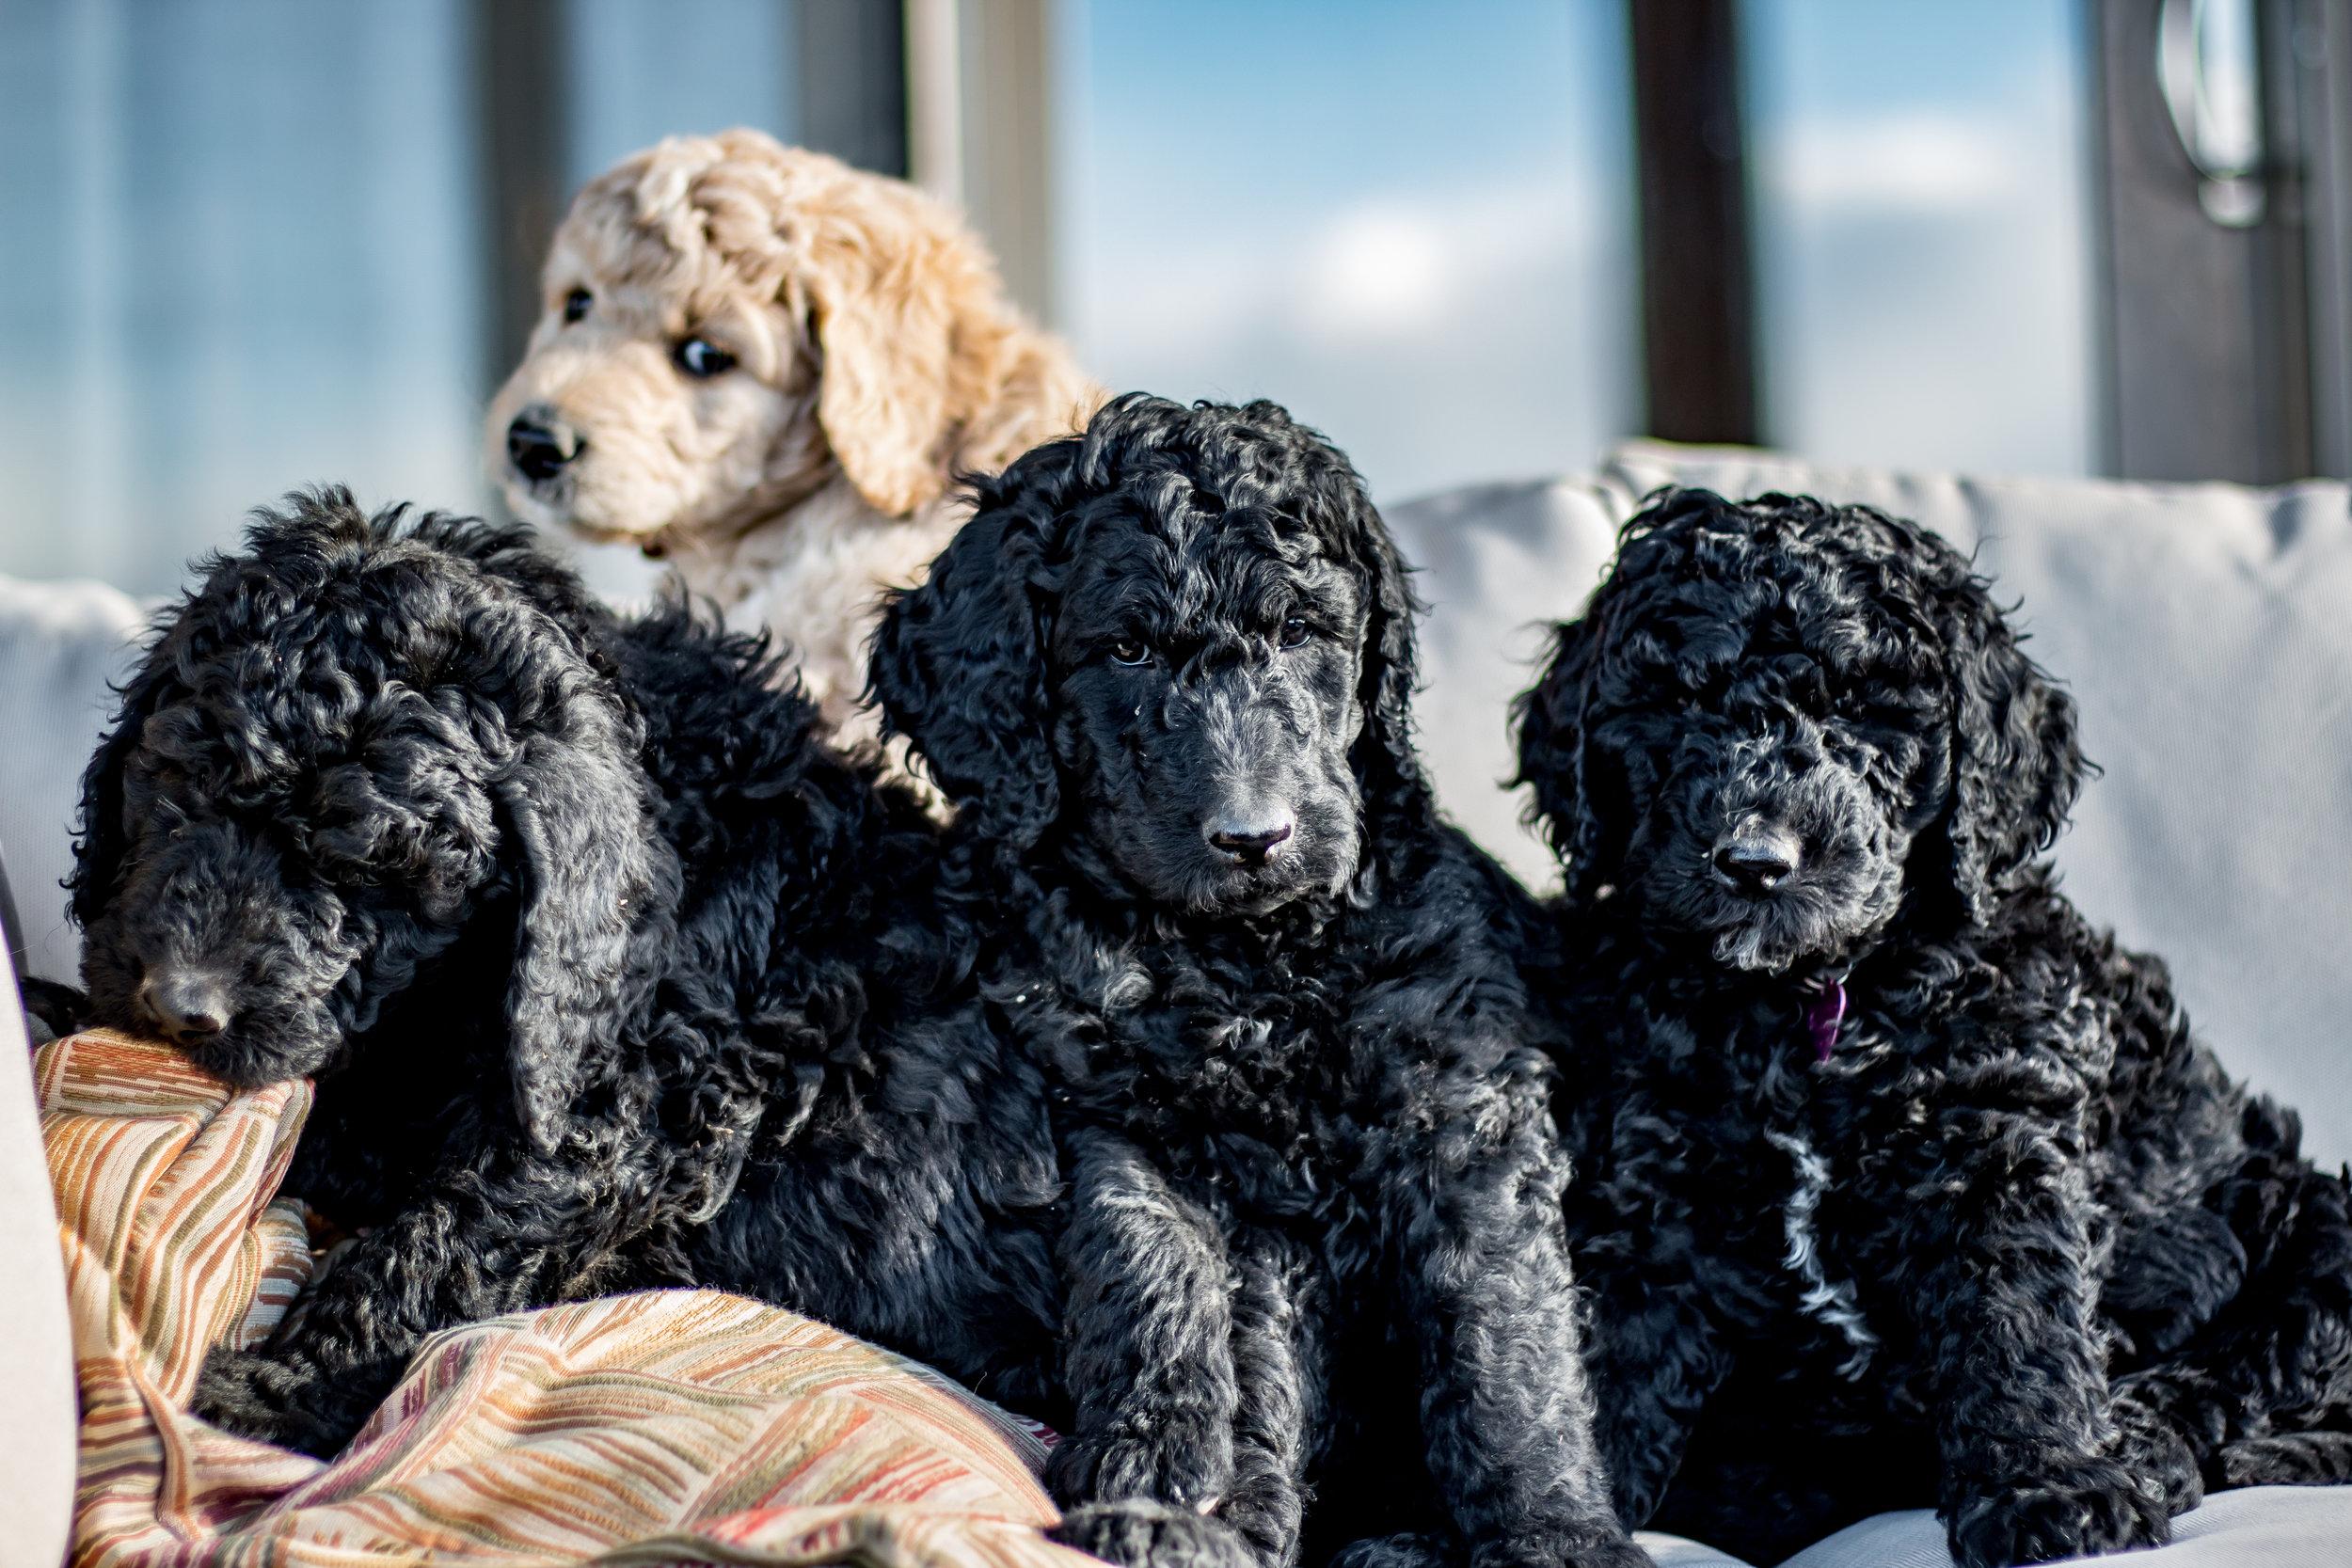 IMG_1219 Puppies.jpg